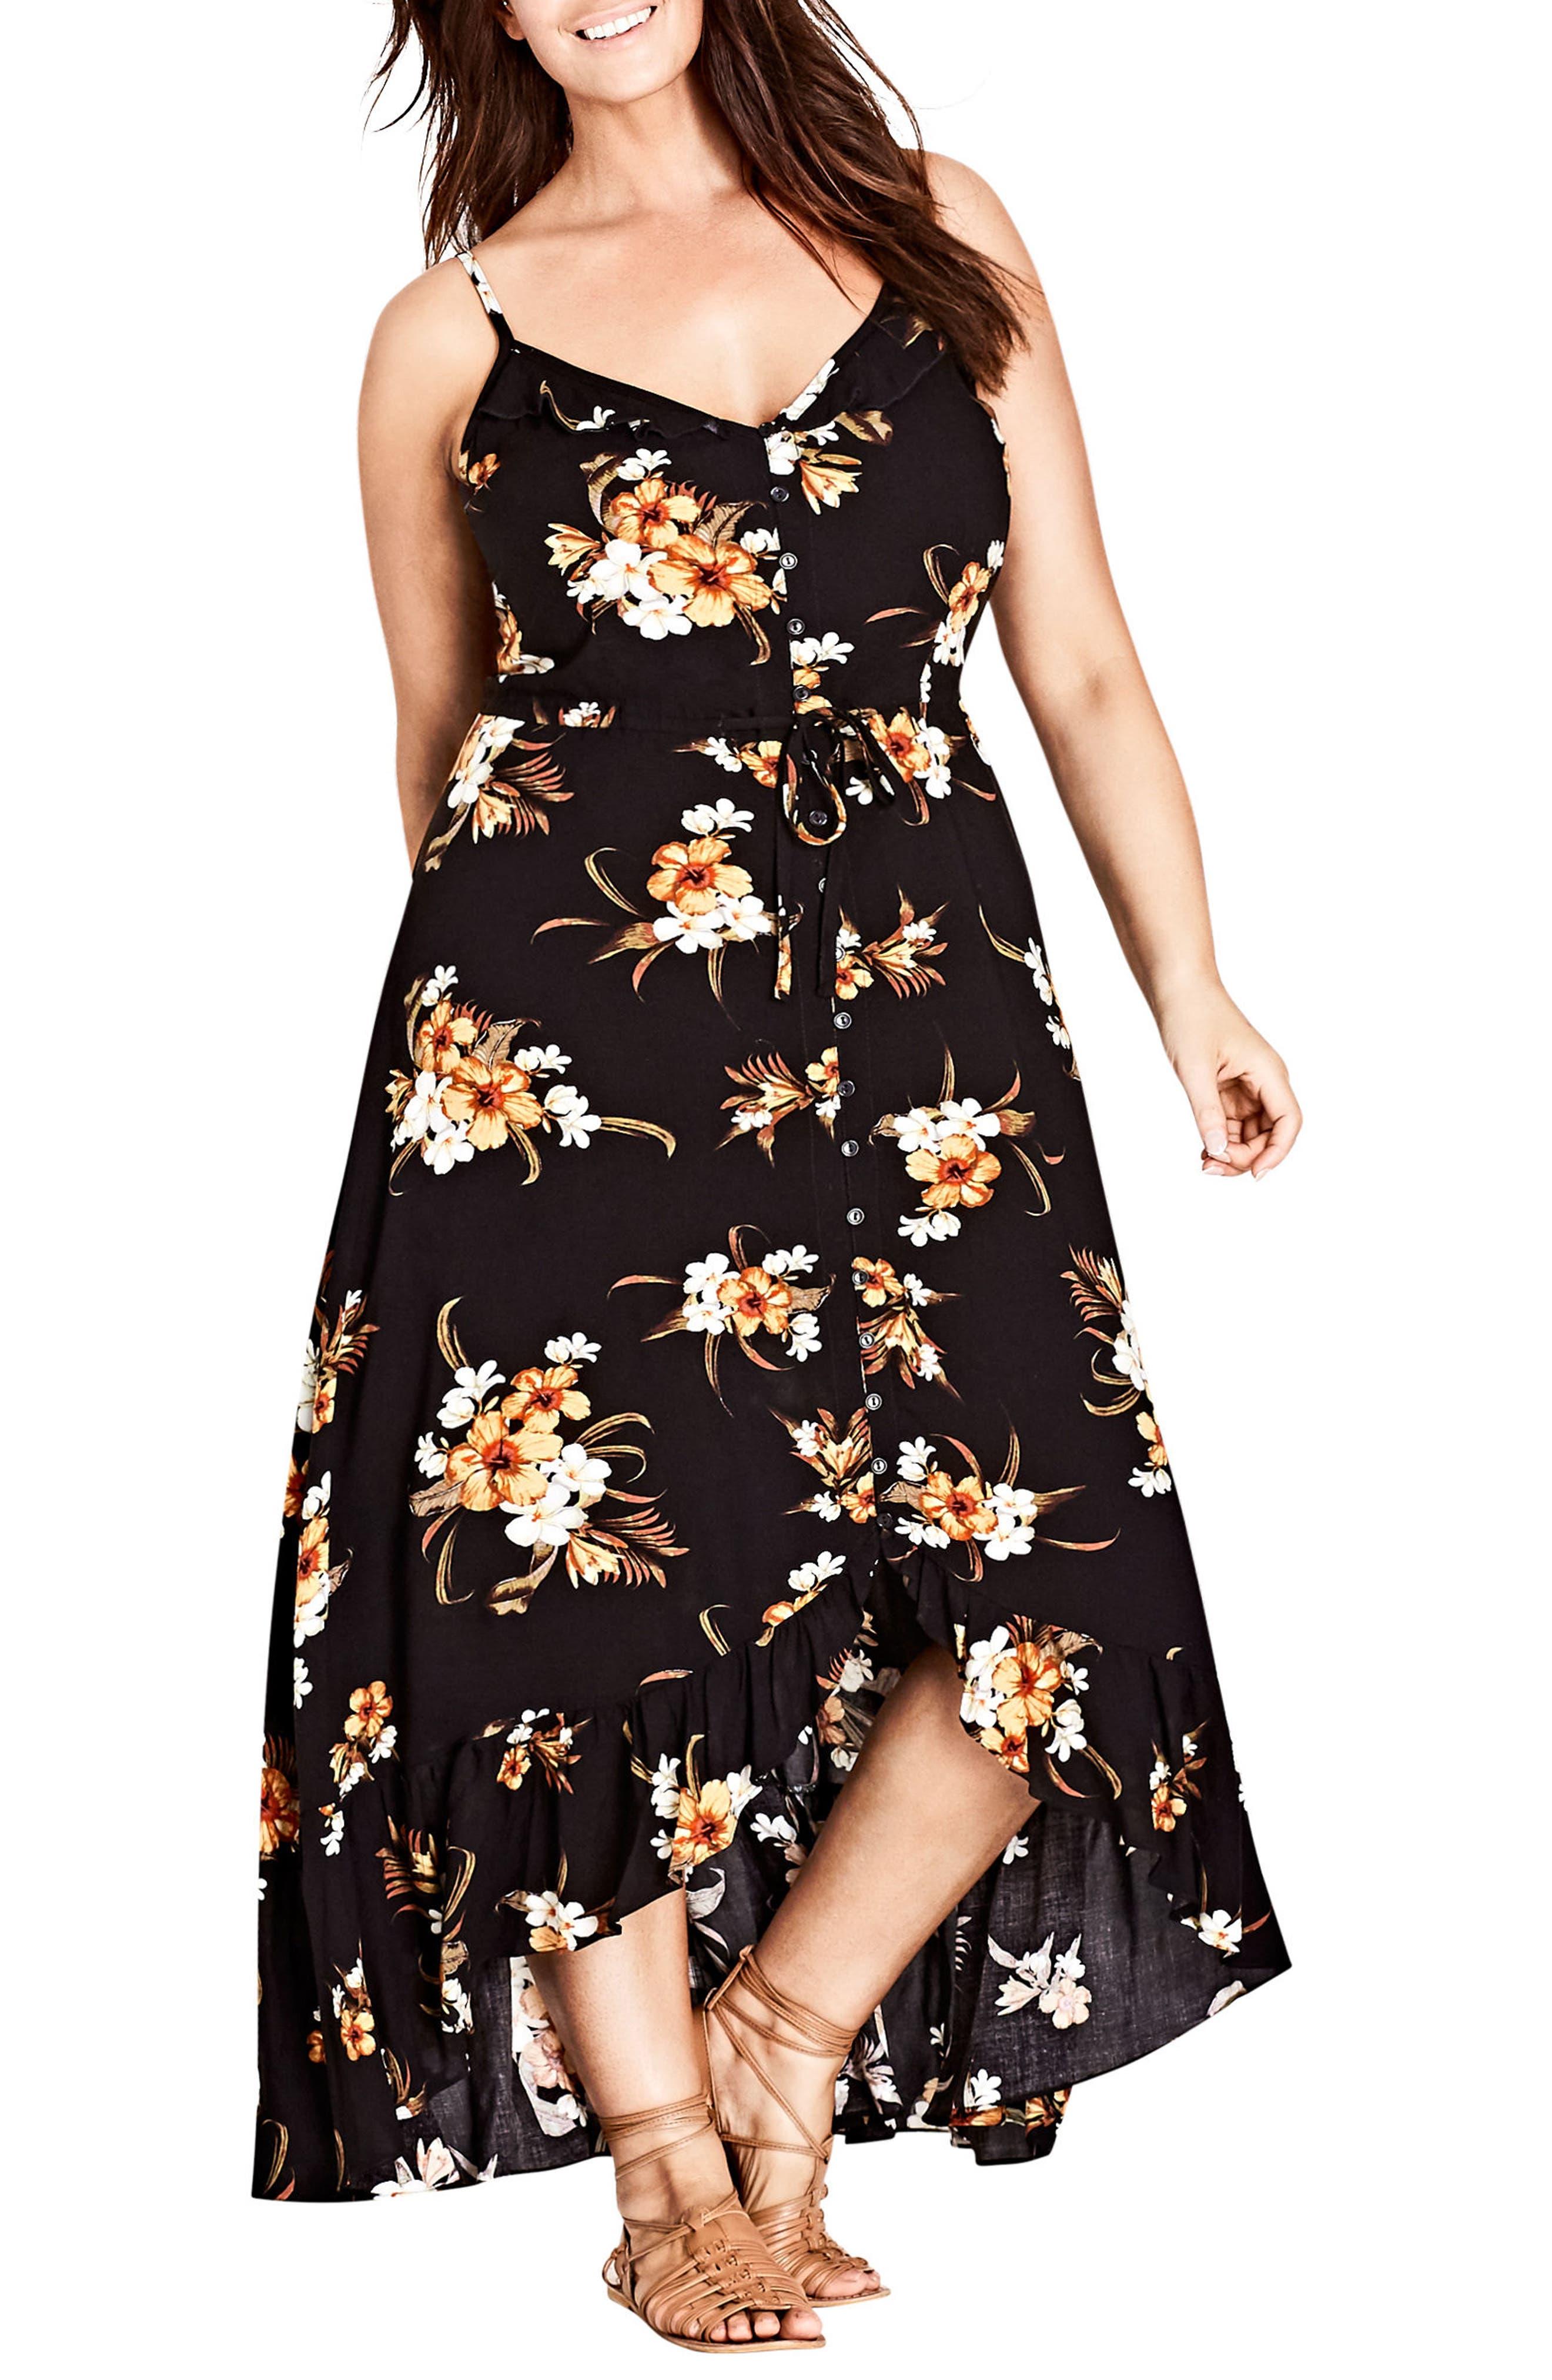 Aruba Floral Maxi Dress,                             Main thumbnail 1, color,                             BLACK PRINT